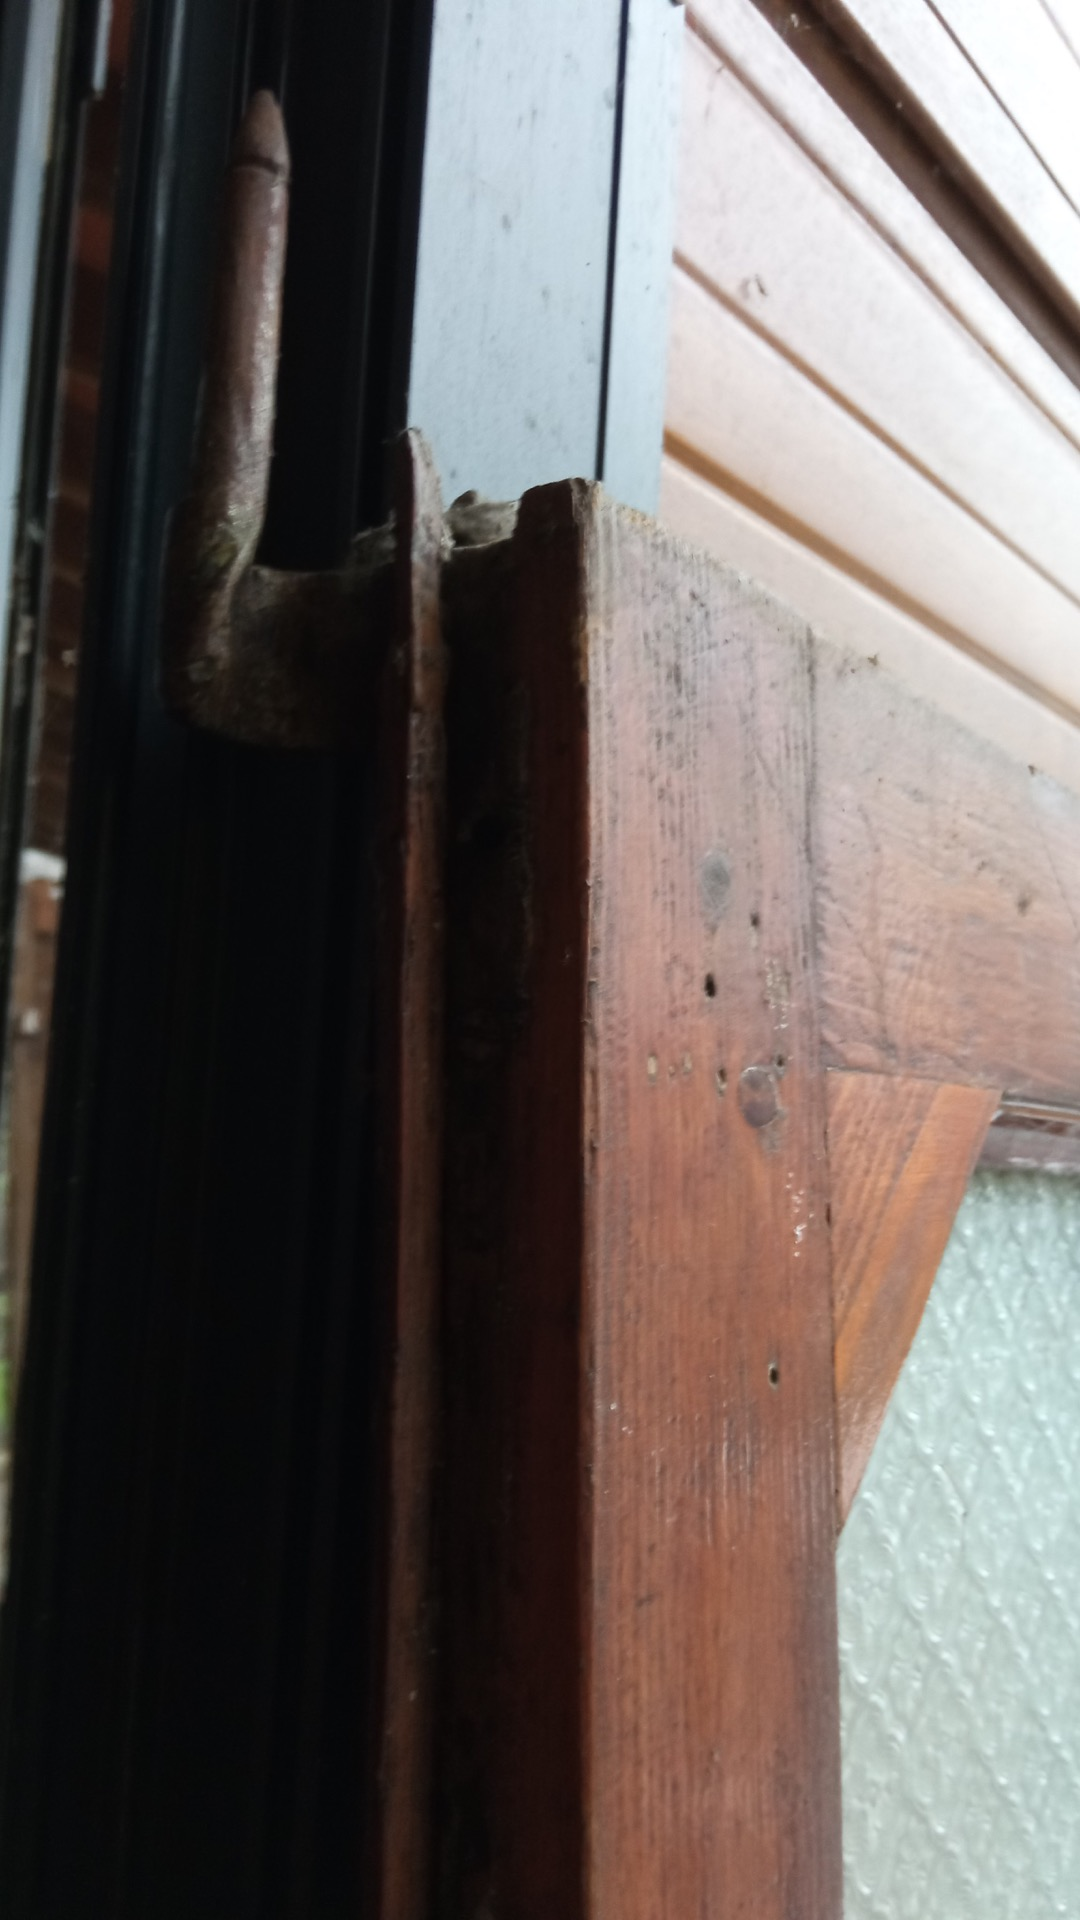 thumb2|4 Türen